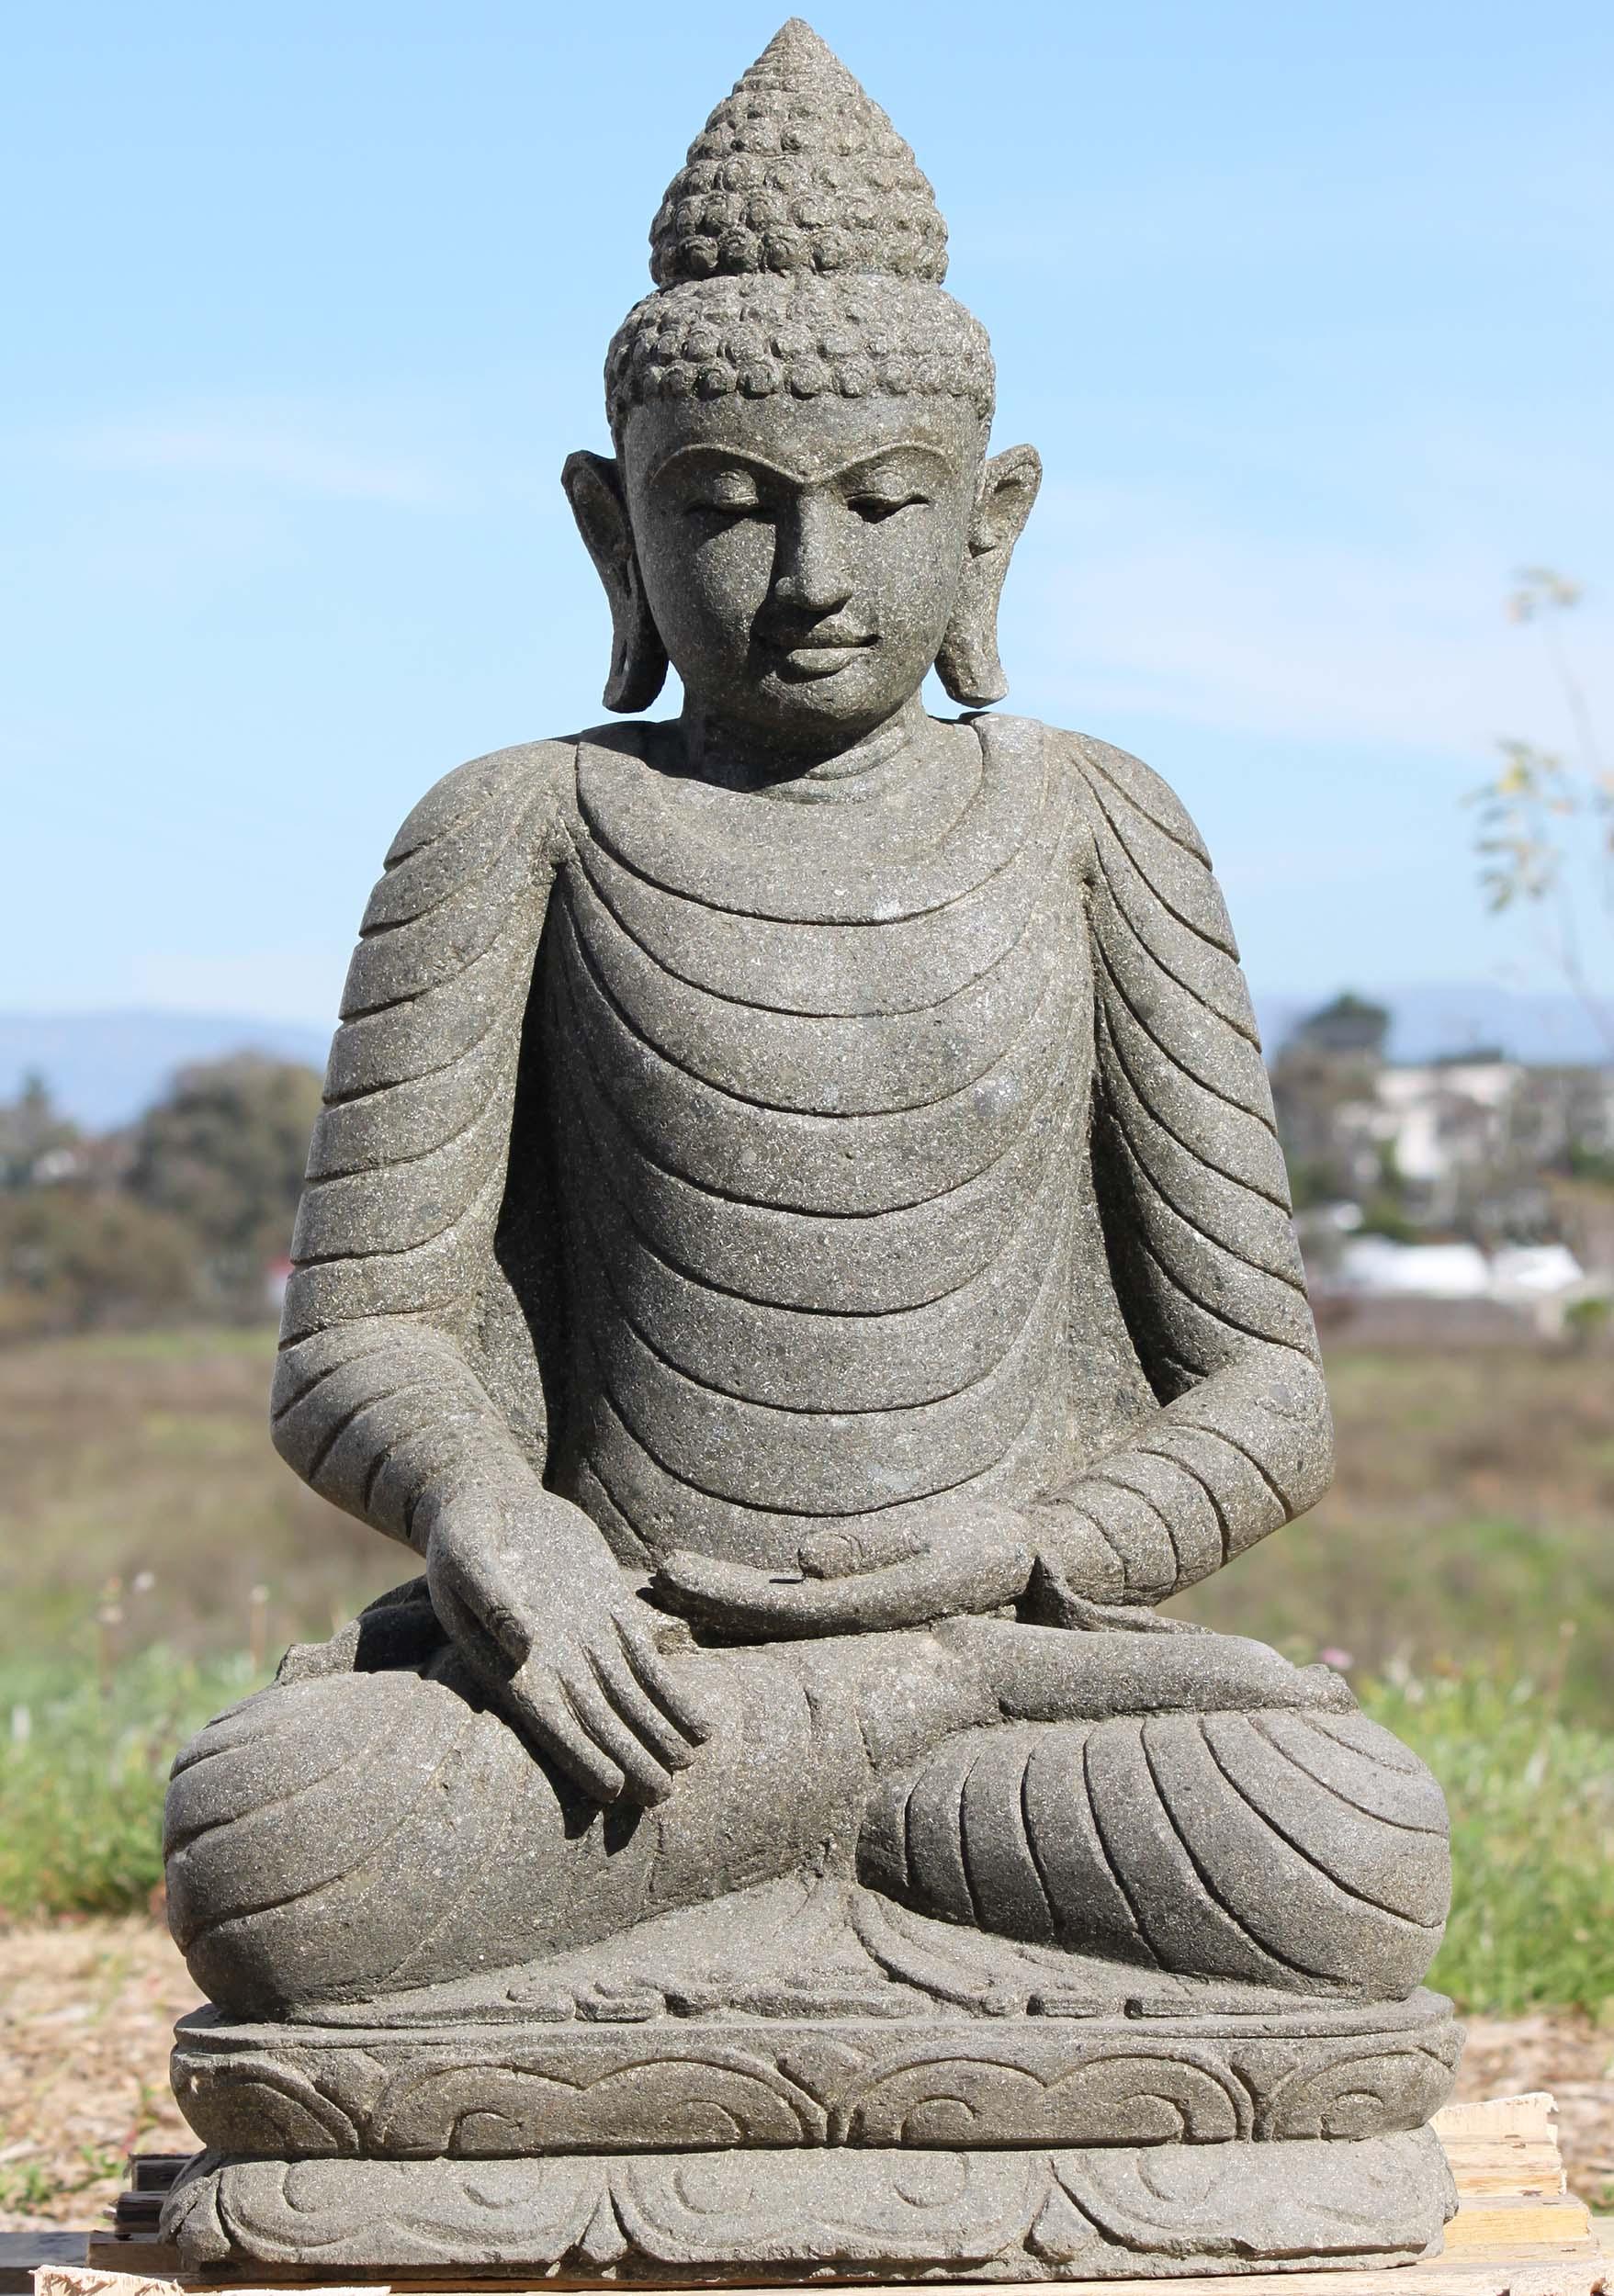 Sold stone varada mudra garden buddha statue 32 97ls301 for Outdoor buddha